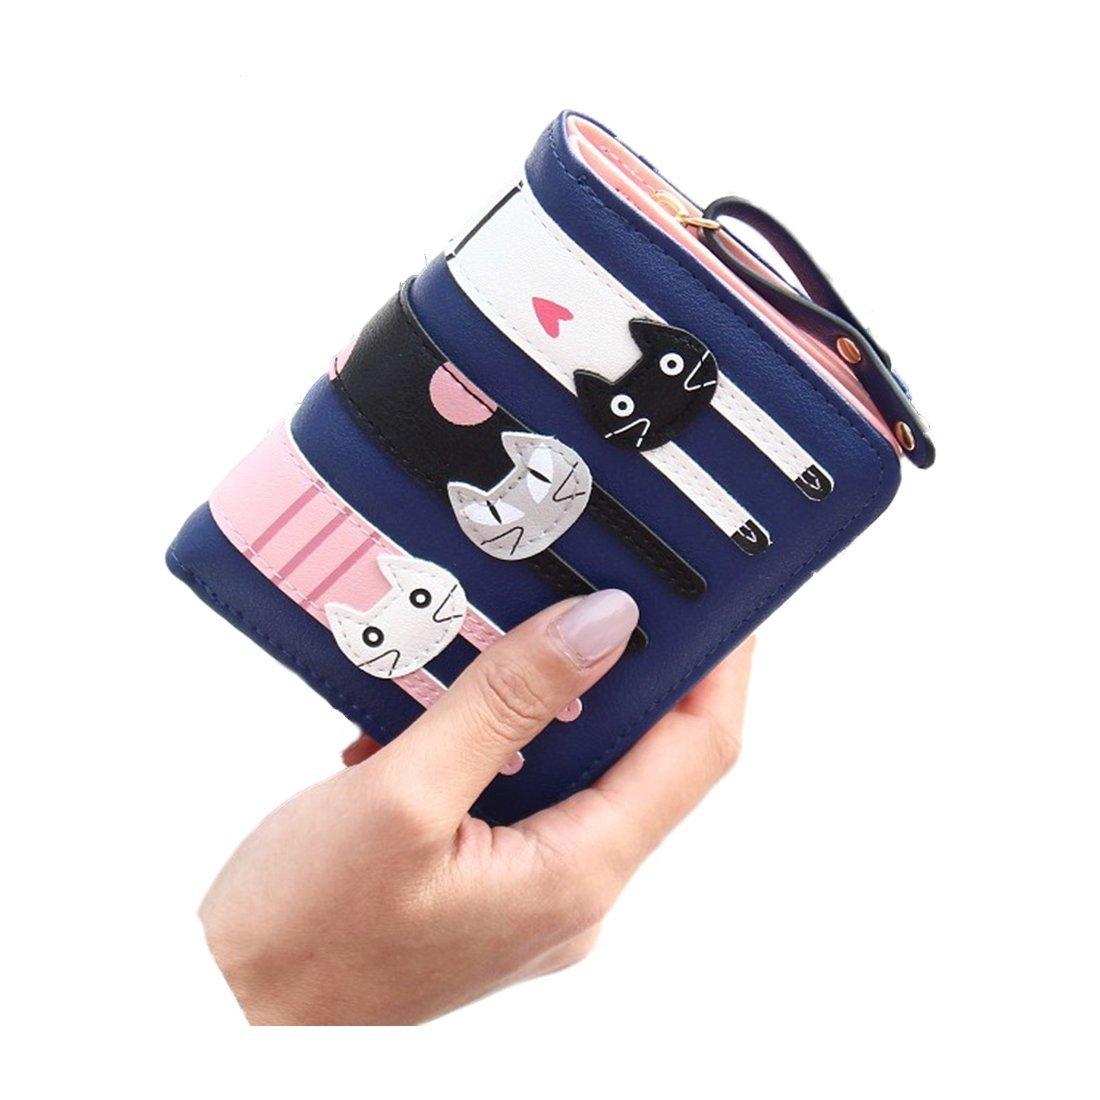 Women Wallet - TOOGOO(R)New Fashion Women Cat Wallet Cartoon purse Female Card Holder Lady clutch coin purse Female zipper£¨Short Blue£